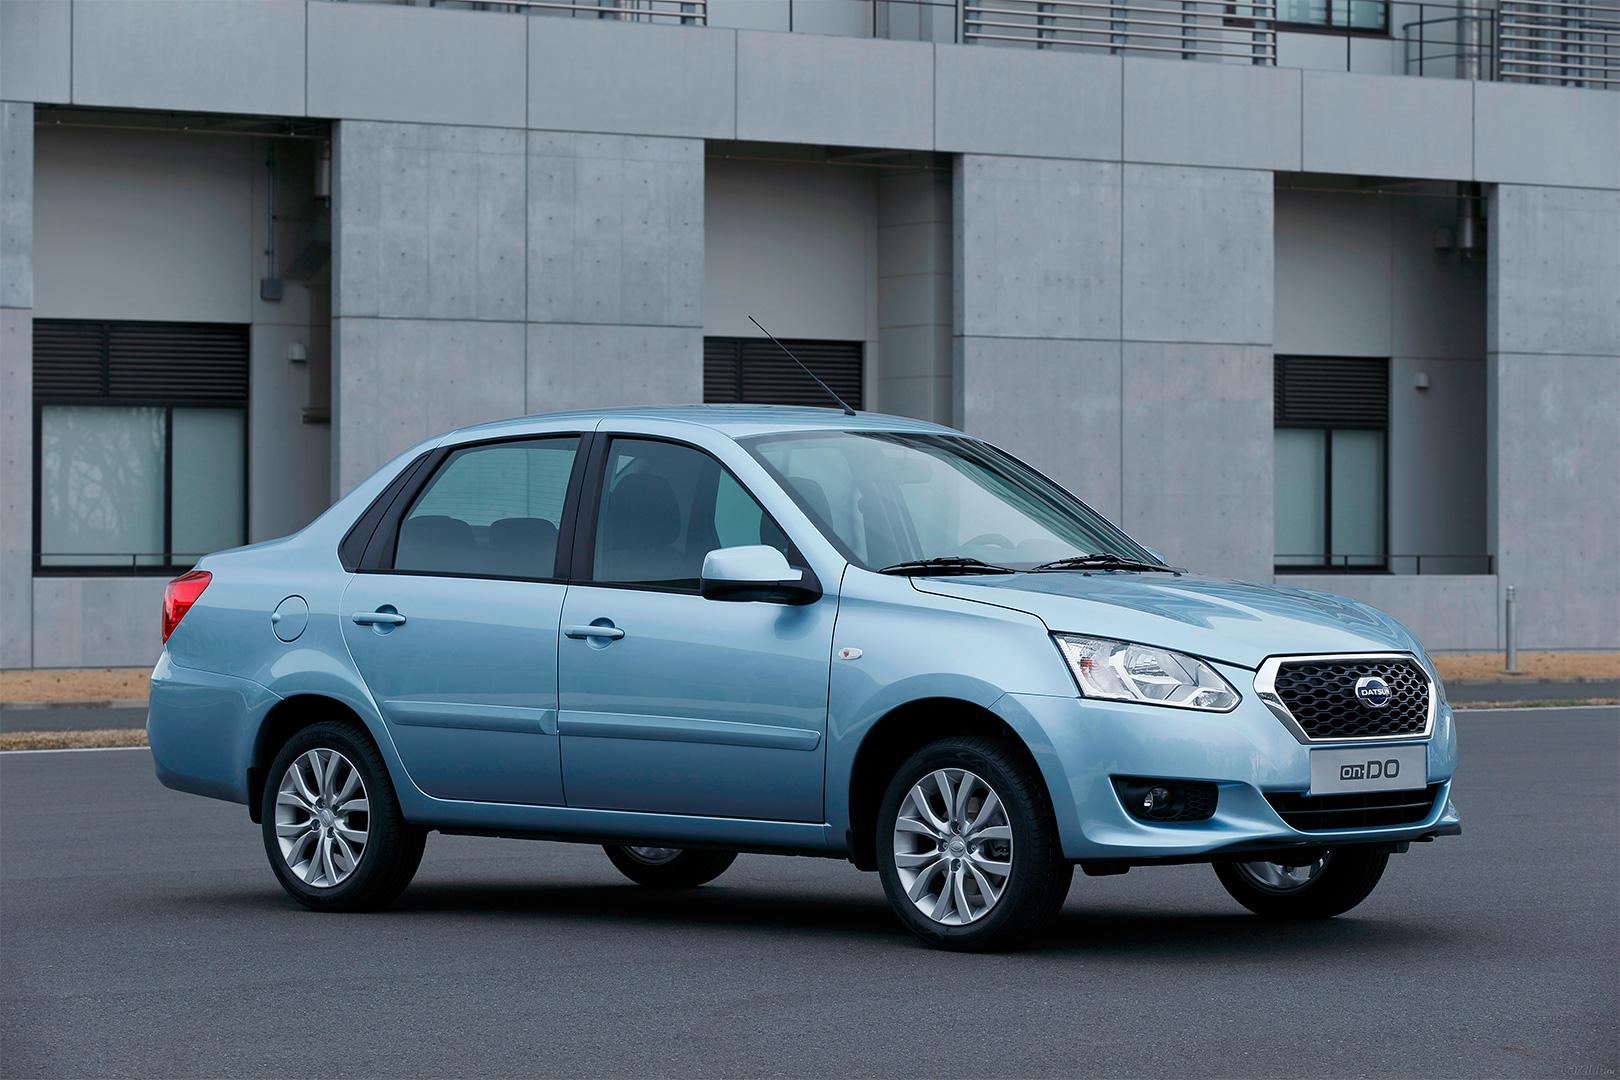 На заводе АвтоВАЗ стартует производство модели Datsun on-DO